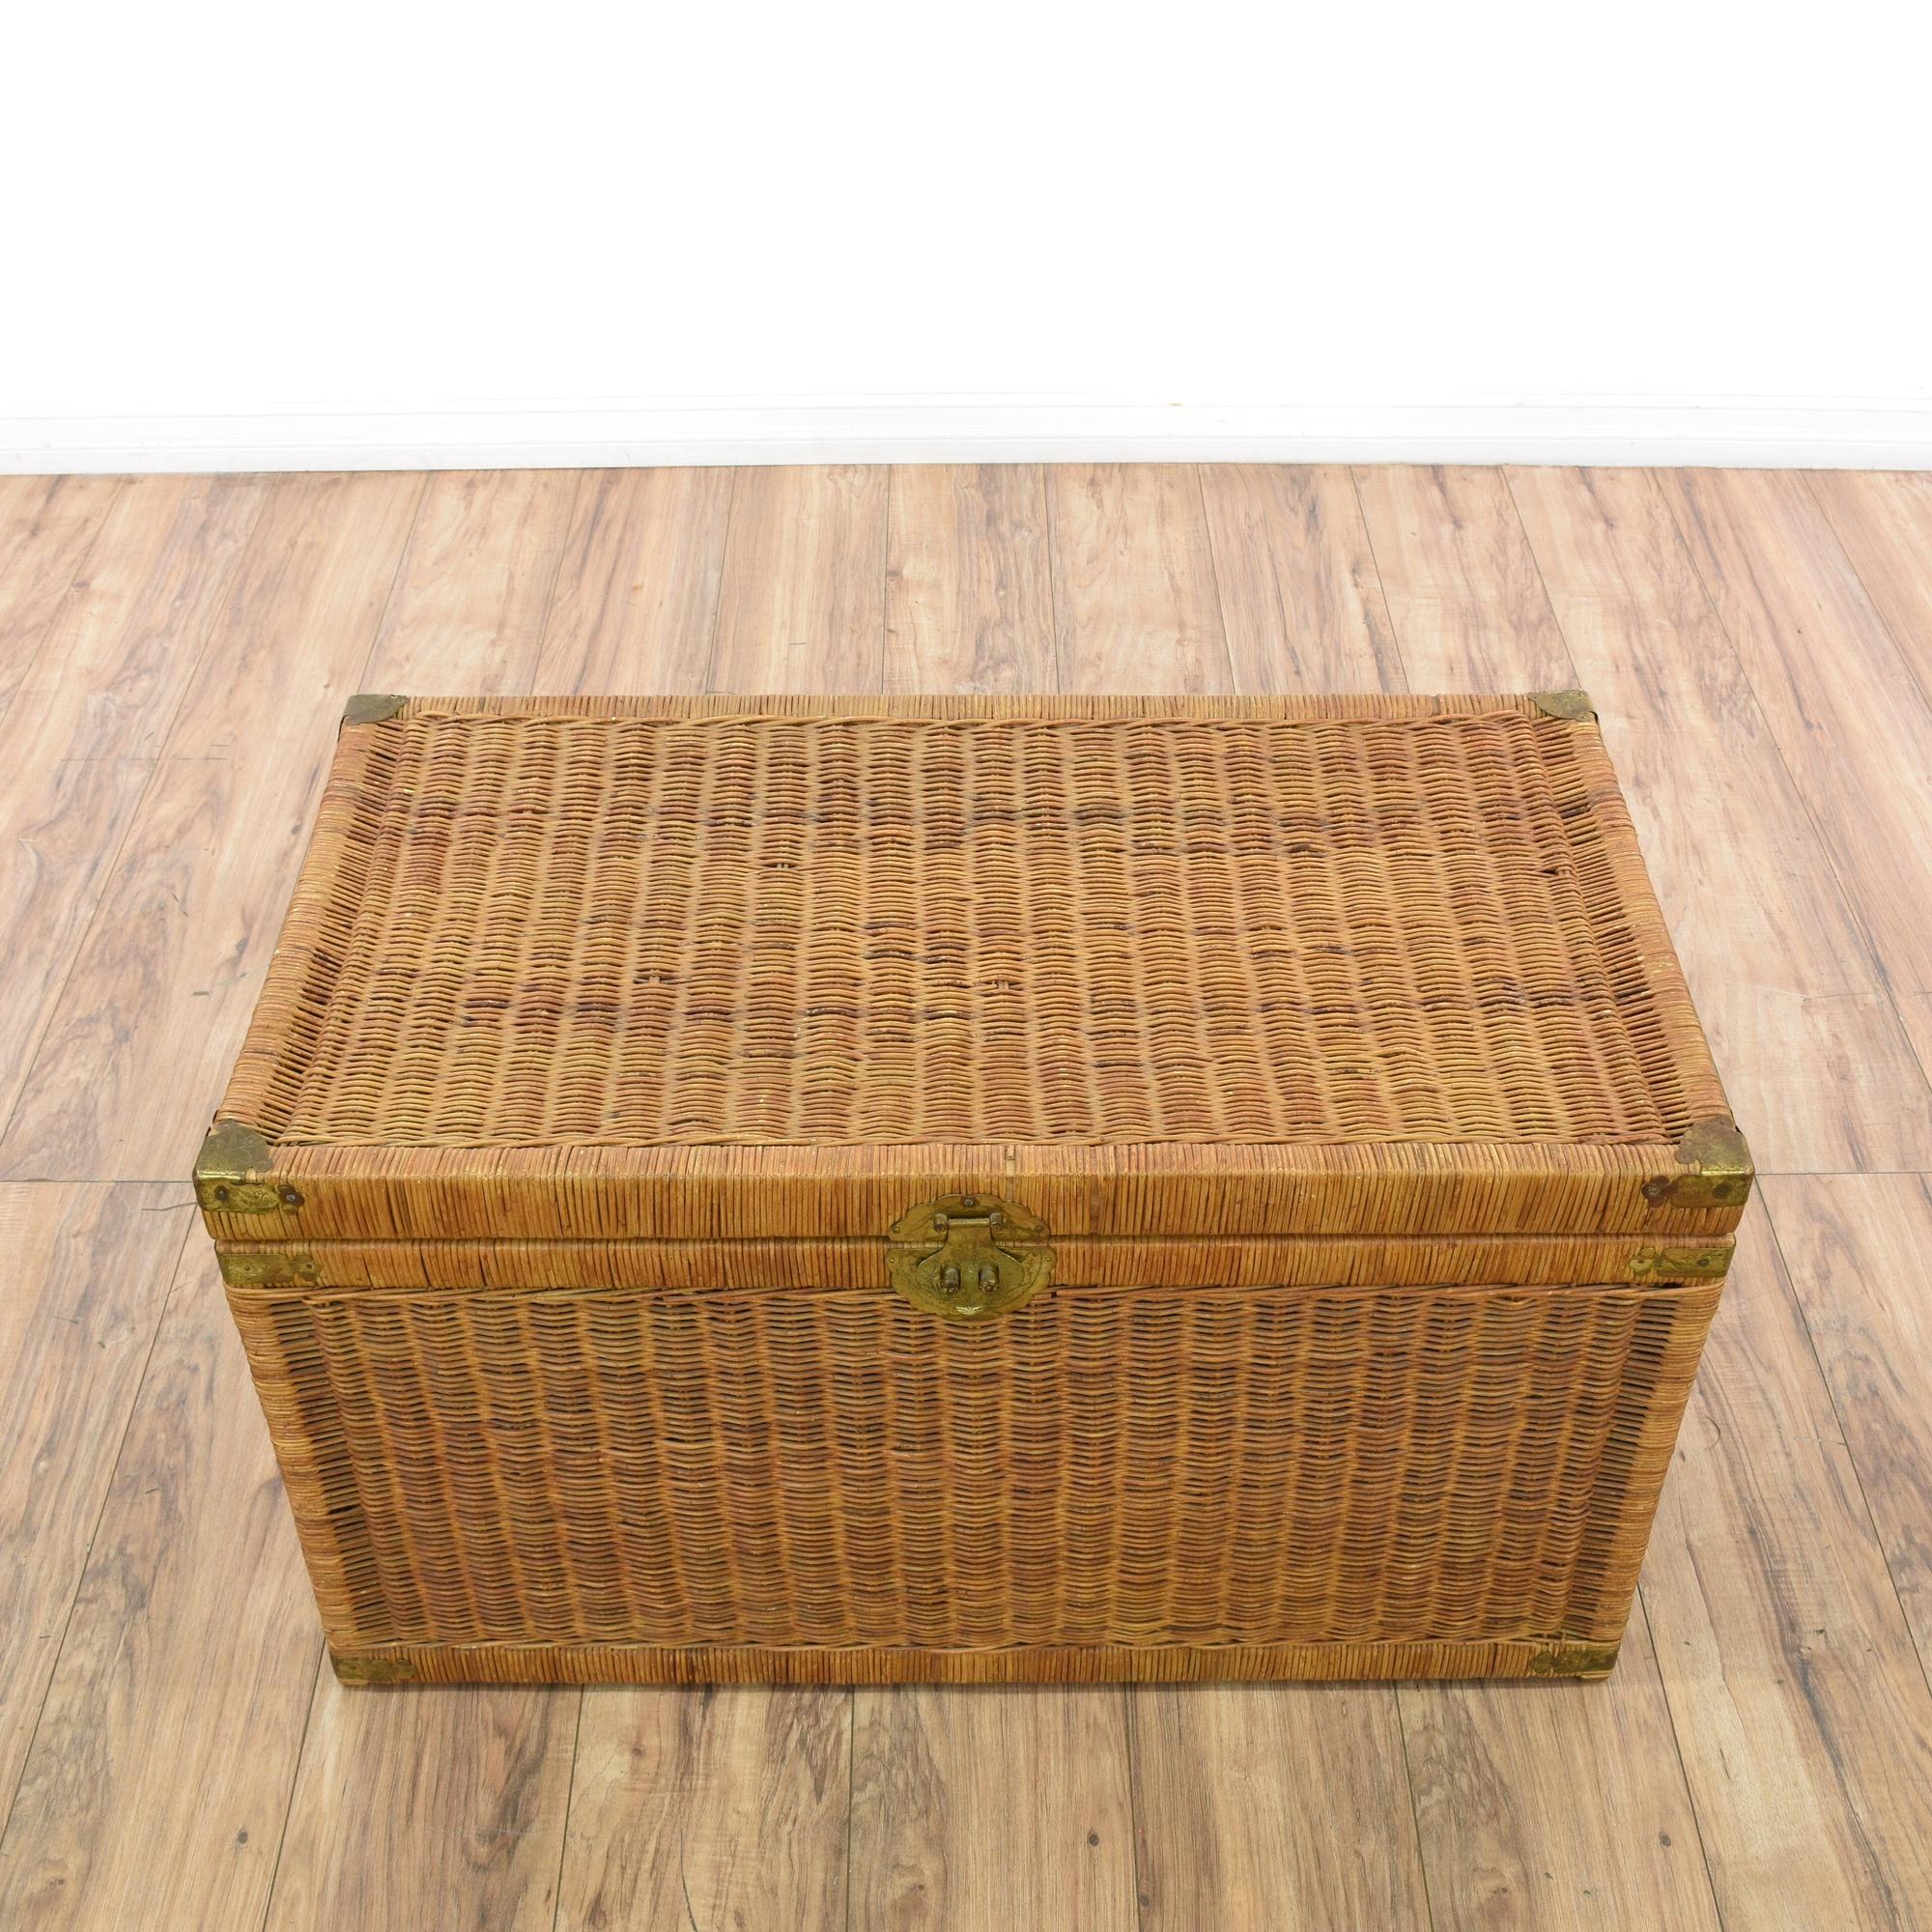 Woven Wicker Tropical Storage Trunk Loveseat Vintage